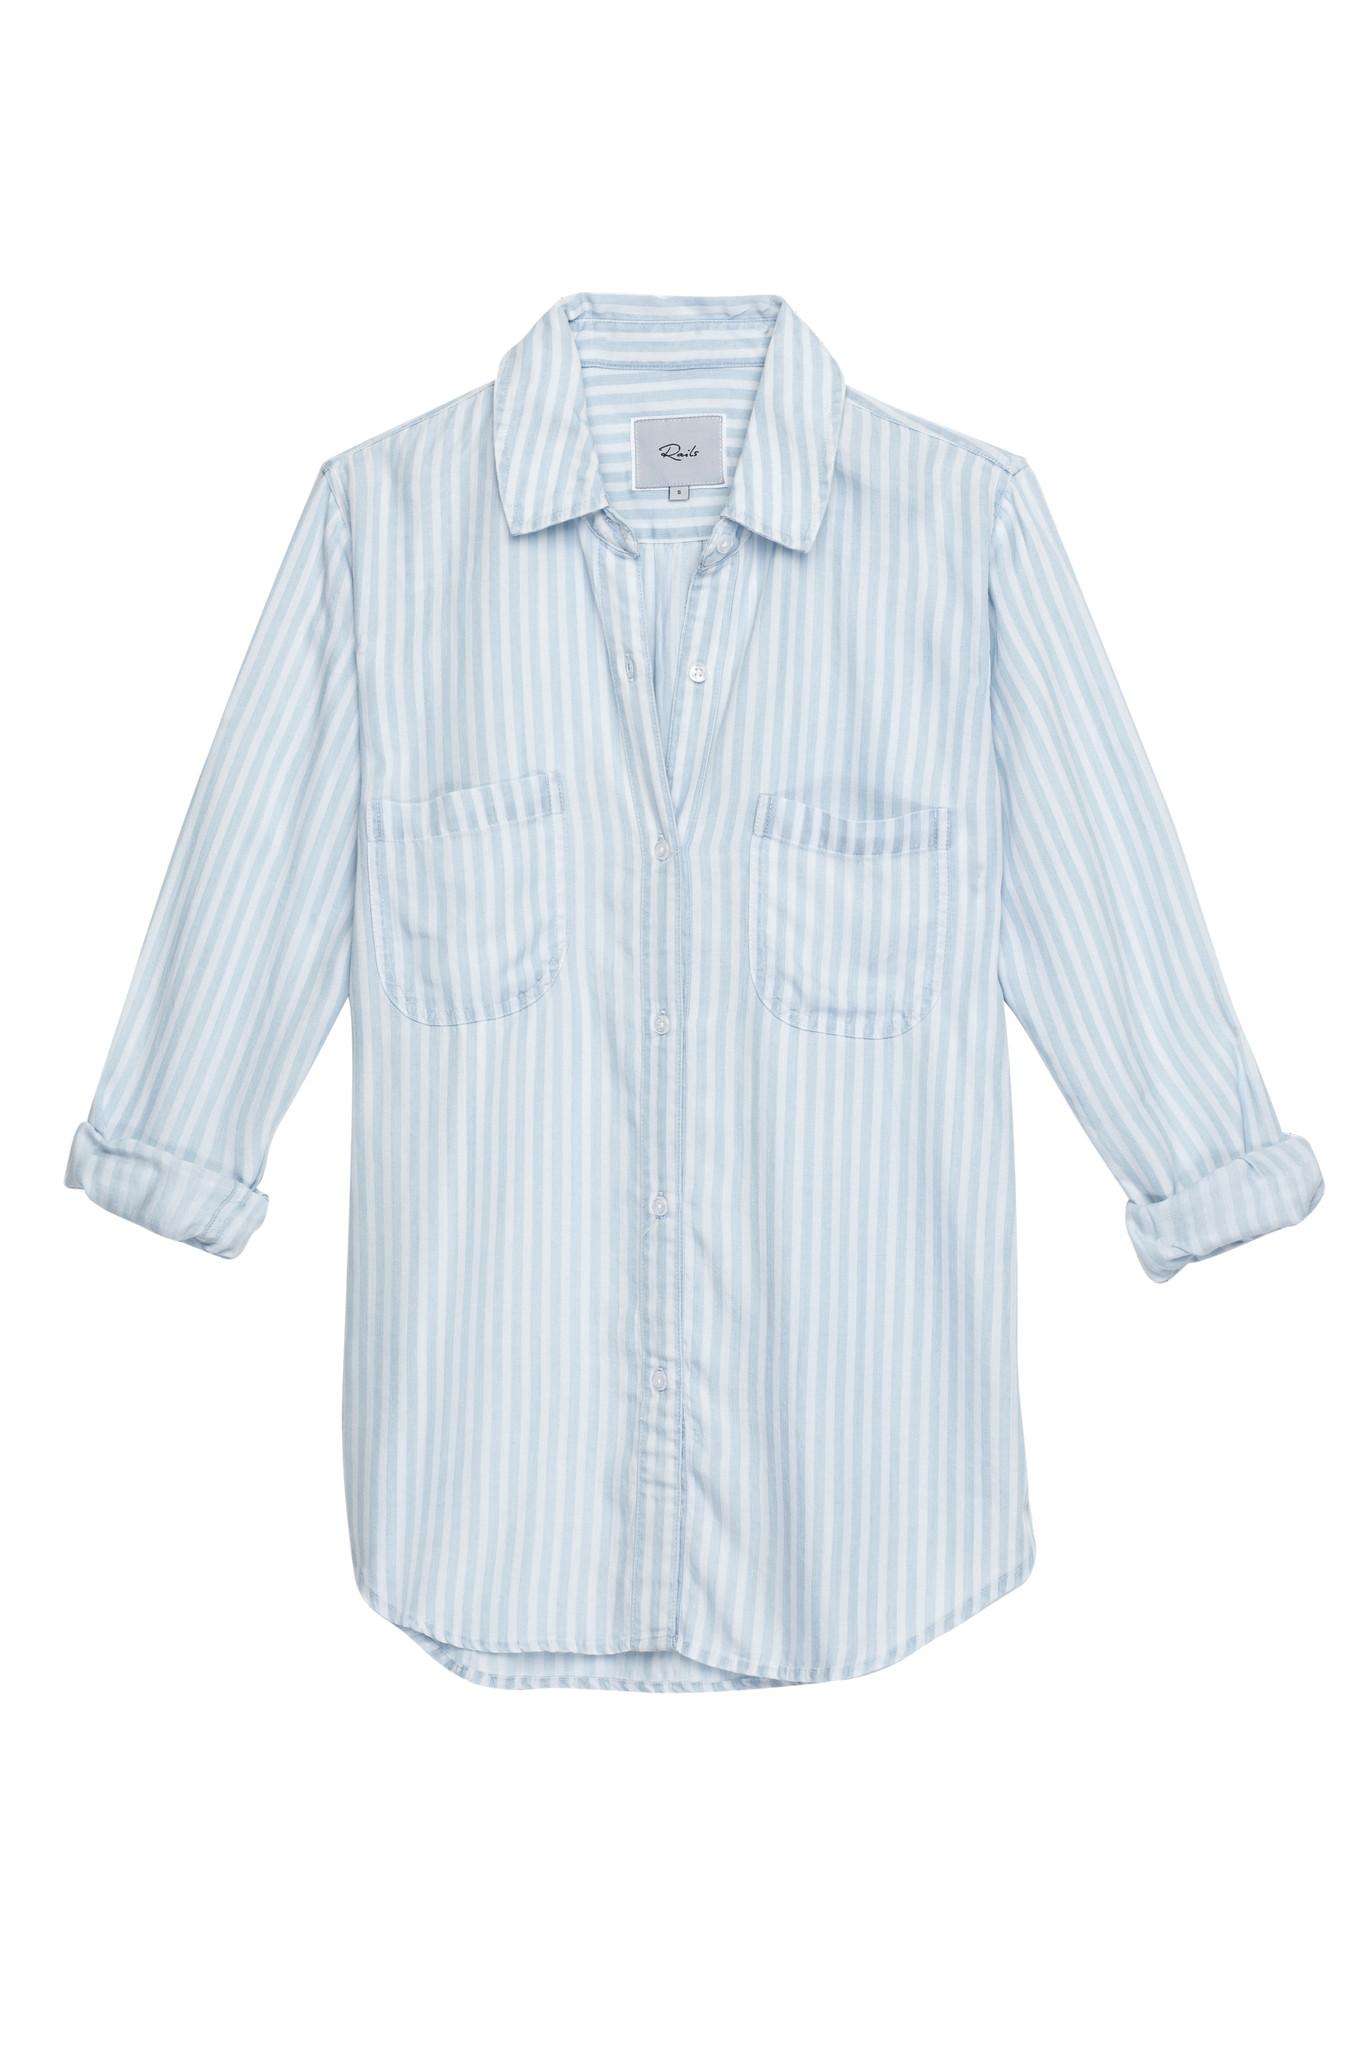 Rails light blue stripe shirt